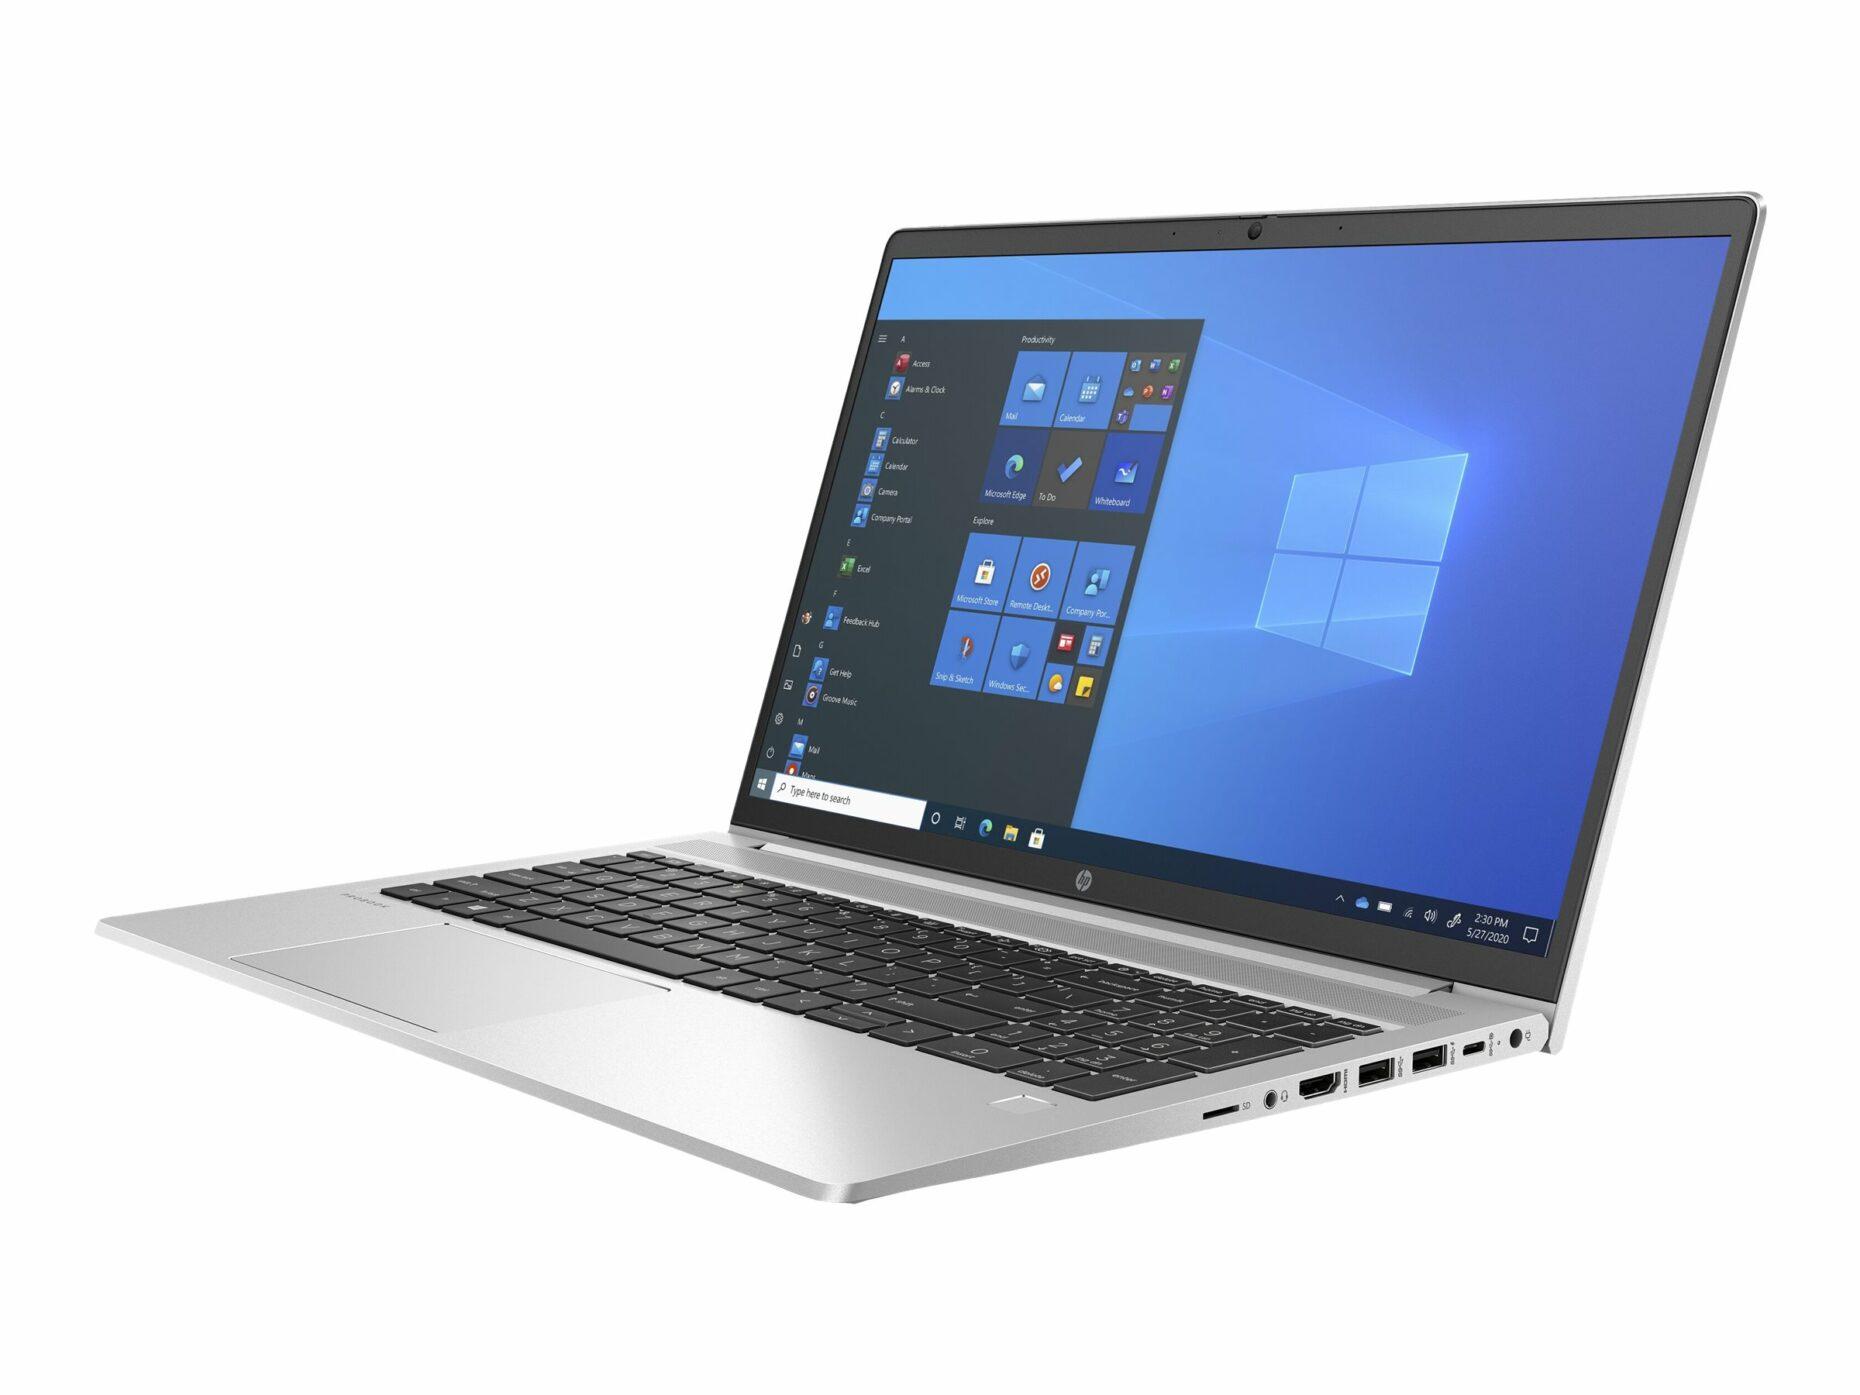 "HP ProBook 455 G8 - Ryzen 5 5600U - Windows 10 Pro - 8 GB RAM - 256 GB SSD - 15.6"" (Full HD) - Radeon Graphics - Notebook"